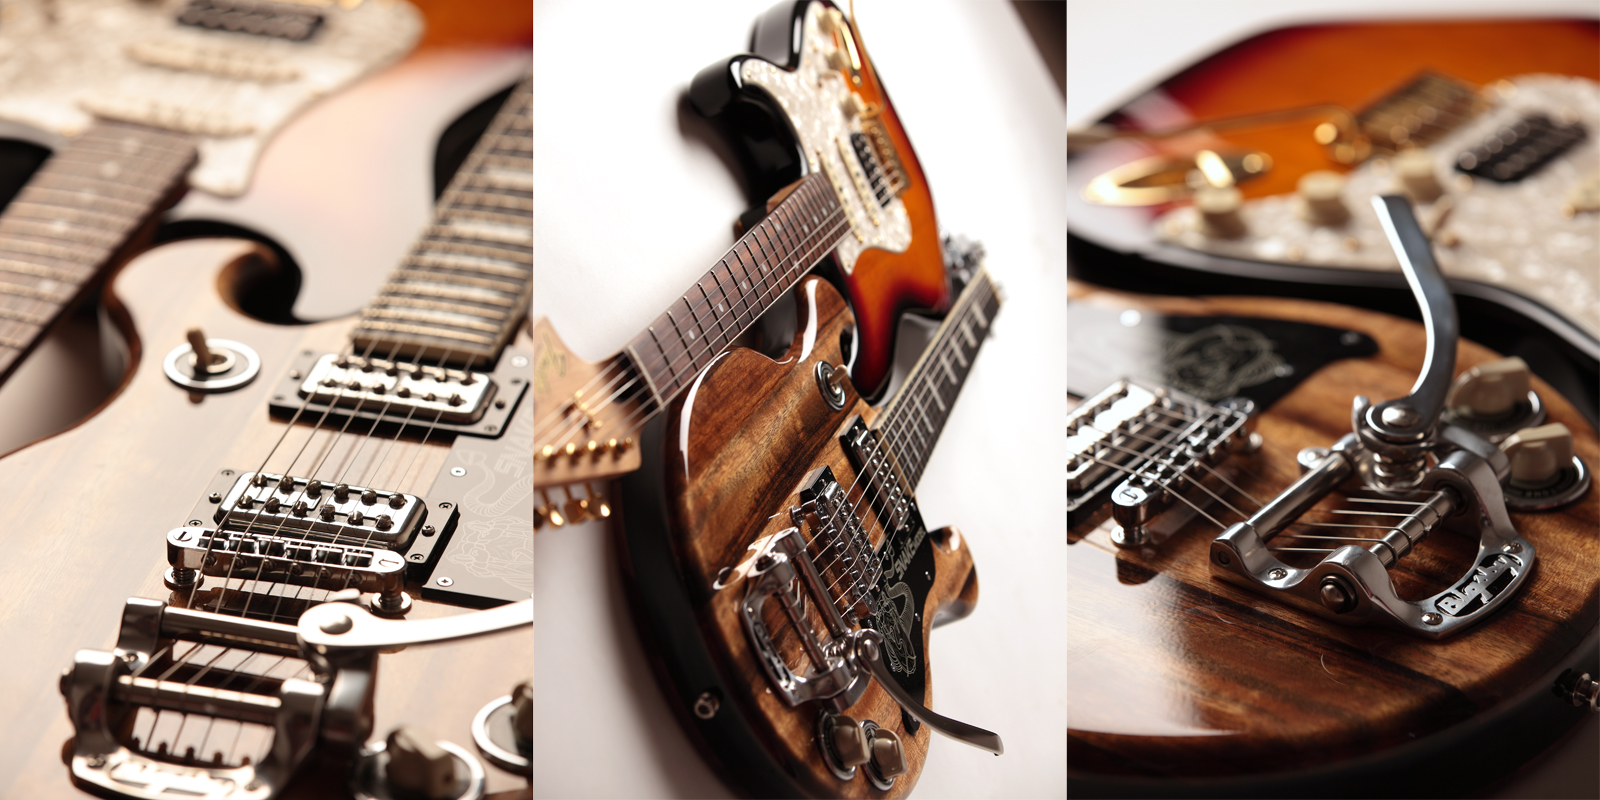 chitarre.jpg